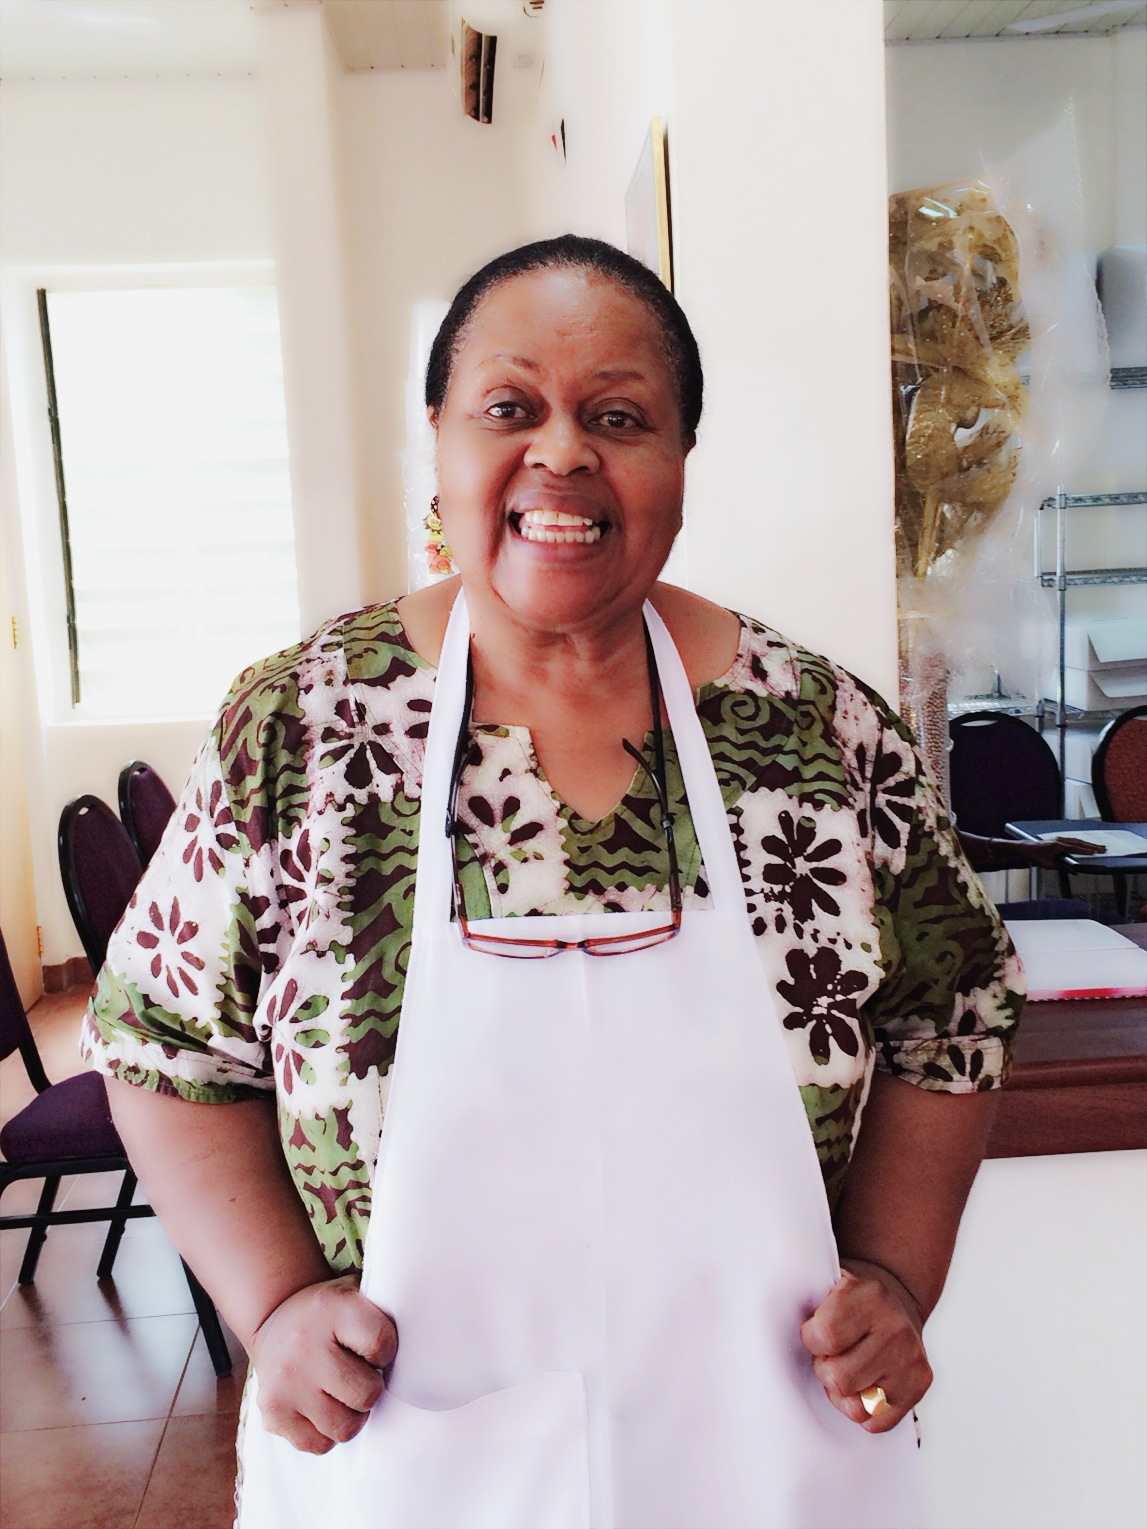 Mrs Blanche Agyeman of BakeShop Classics